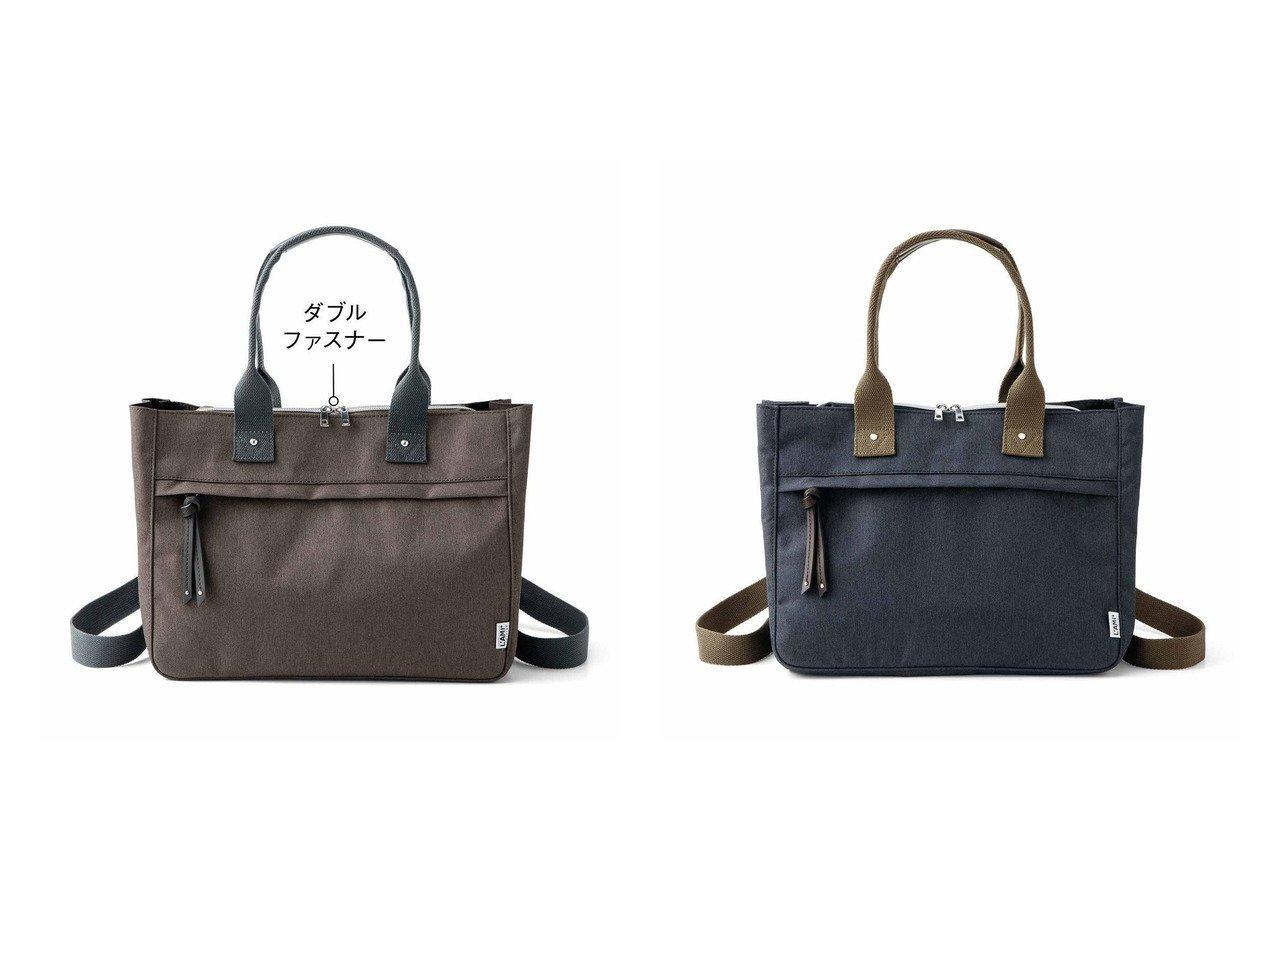 【Kraso/クラソ】の荷物を放り込むだけでスッキリ仕分け T字形の仕切り付きトートバッグ〈撥水 おすすめ!人気、トレンド・レディースファッションの通販 おすすめで人気の流行・トレンド、ファッションの通販商品 インテリア・家具・メンズファッション・キッズファッション・レディースファッション・服の通販 founy(ファニー) https://founy.com/ ファッション Fashion レディースファッション WOMEN バッグ Bag 春 Spring 財布 リュック 2020年 2020 S/S・春夏 SS・Spring/Summer 2020春夏・S/S SS・Spring/Summer/2020 夏 Summer  ID:crp329100000071020